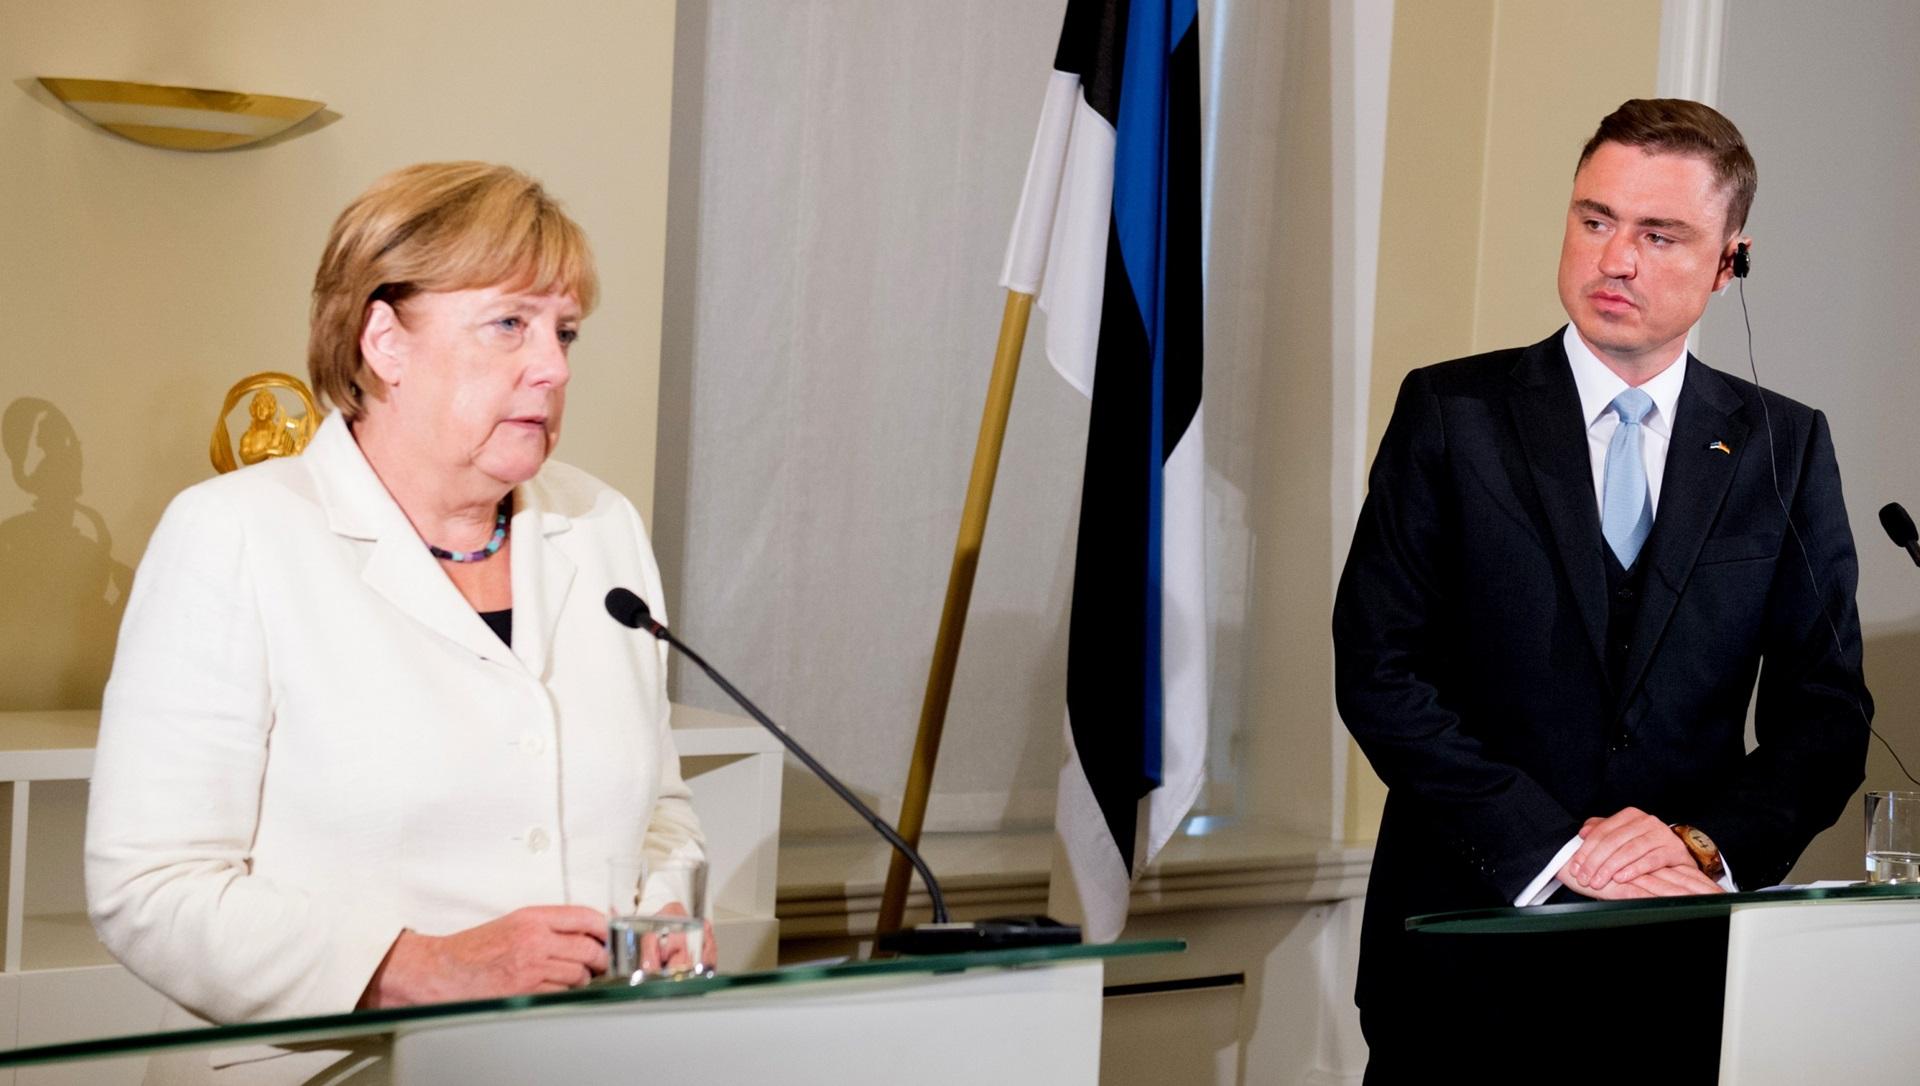 Bad information about estonia!?